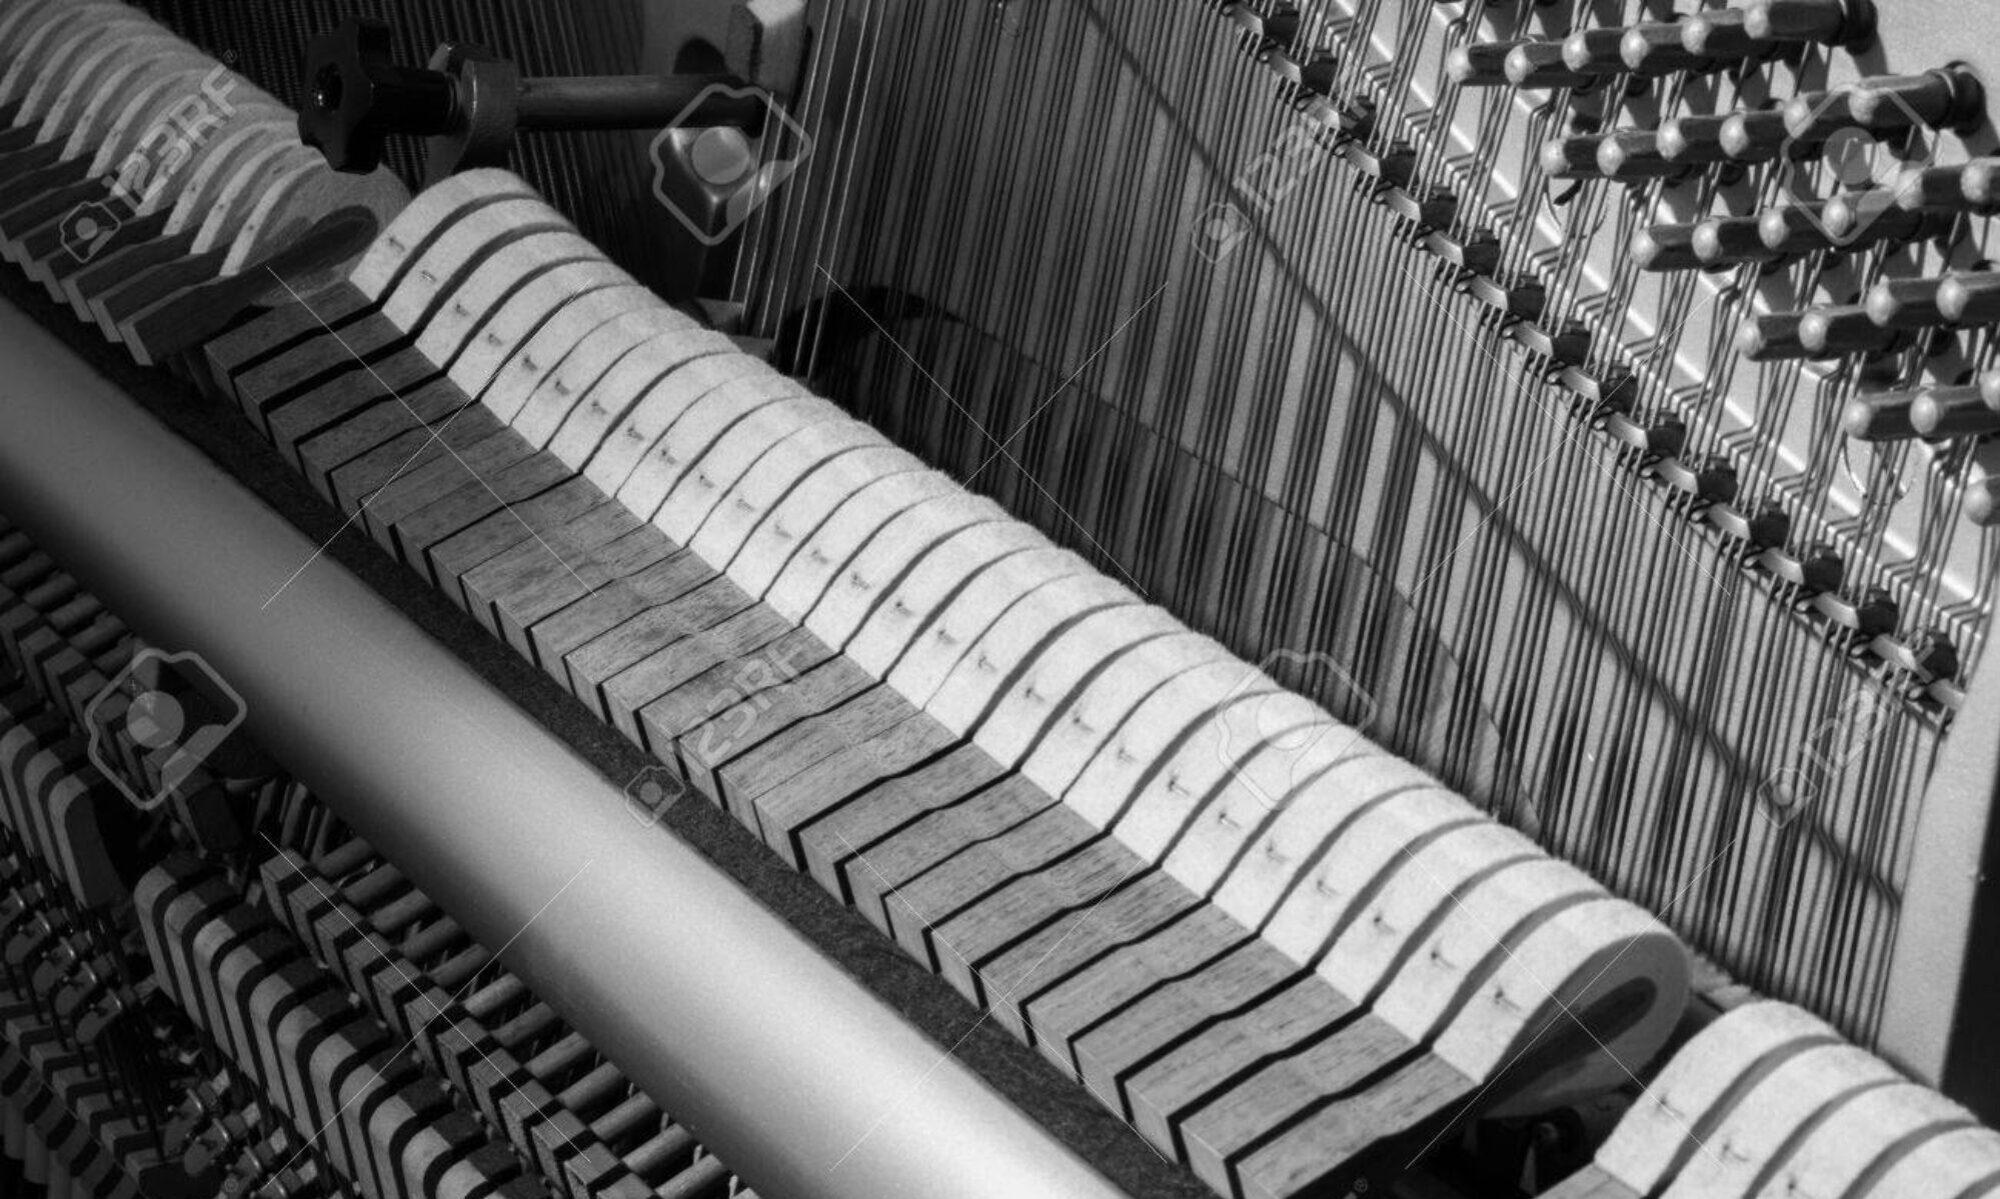 Piano Inn 琴棧 丨 鋼琴調音及維修翻新